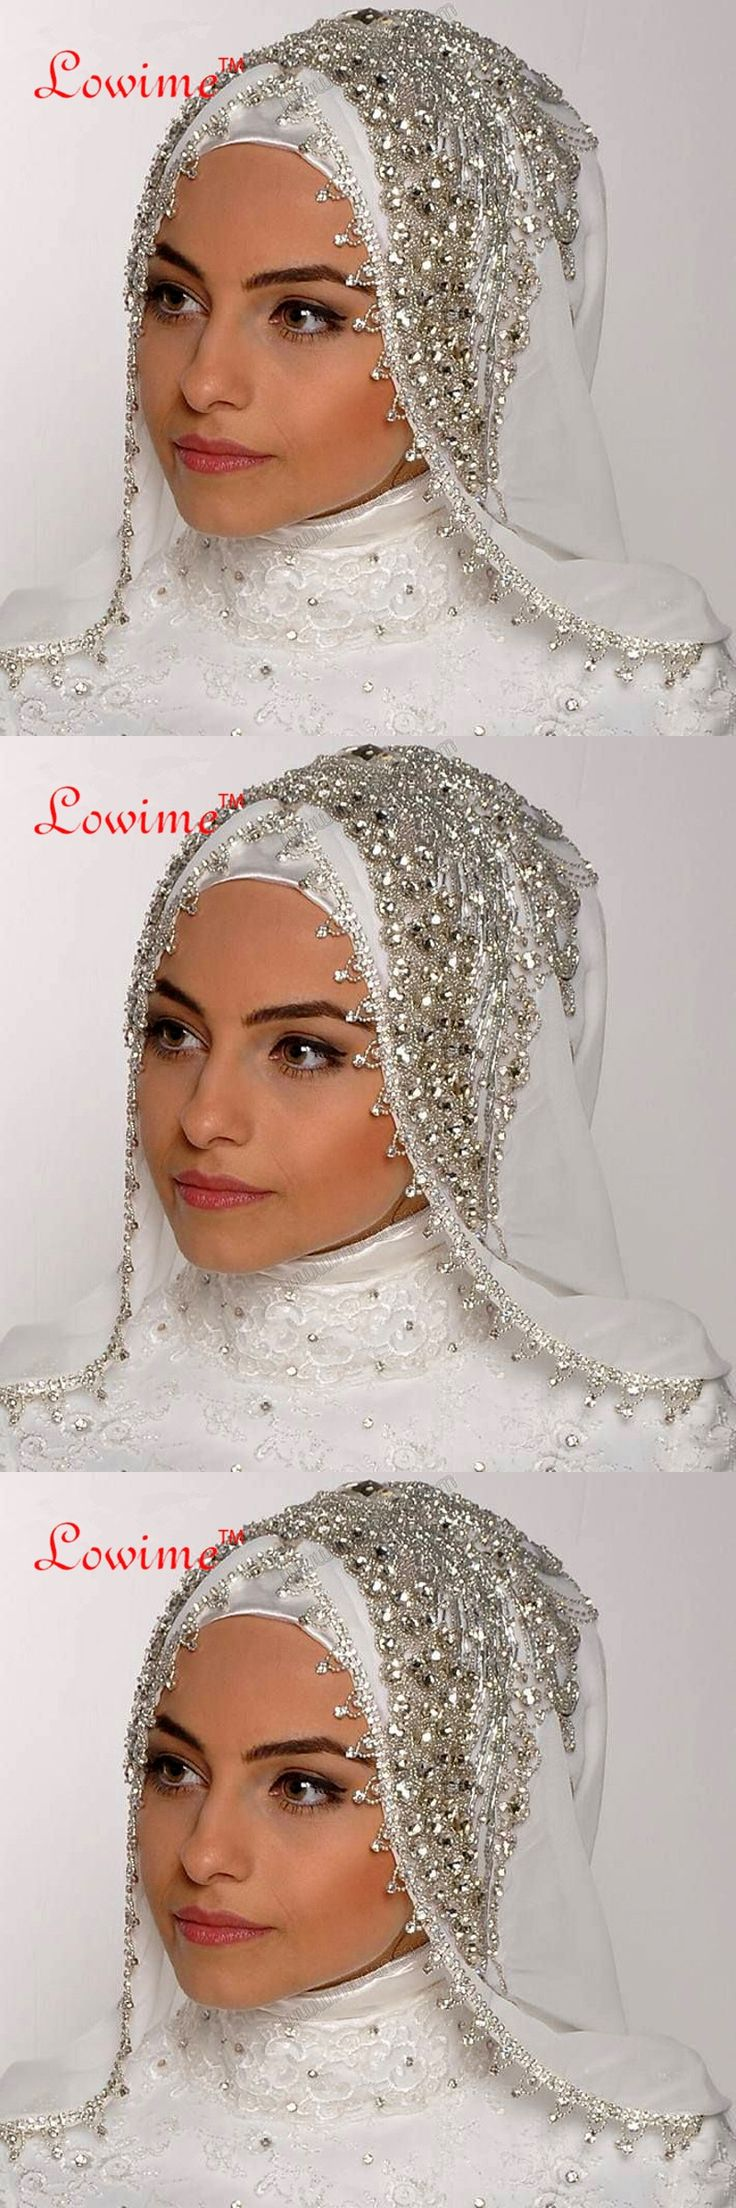 Luxury Sewing Beads Crystal Veils Custom Made Color Length Wide Muslim Veils Hijab One Layer Handy Made Wedding Veil LW-107